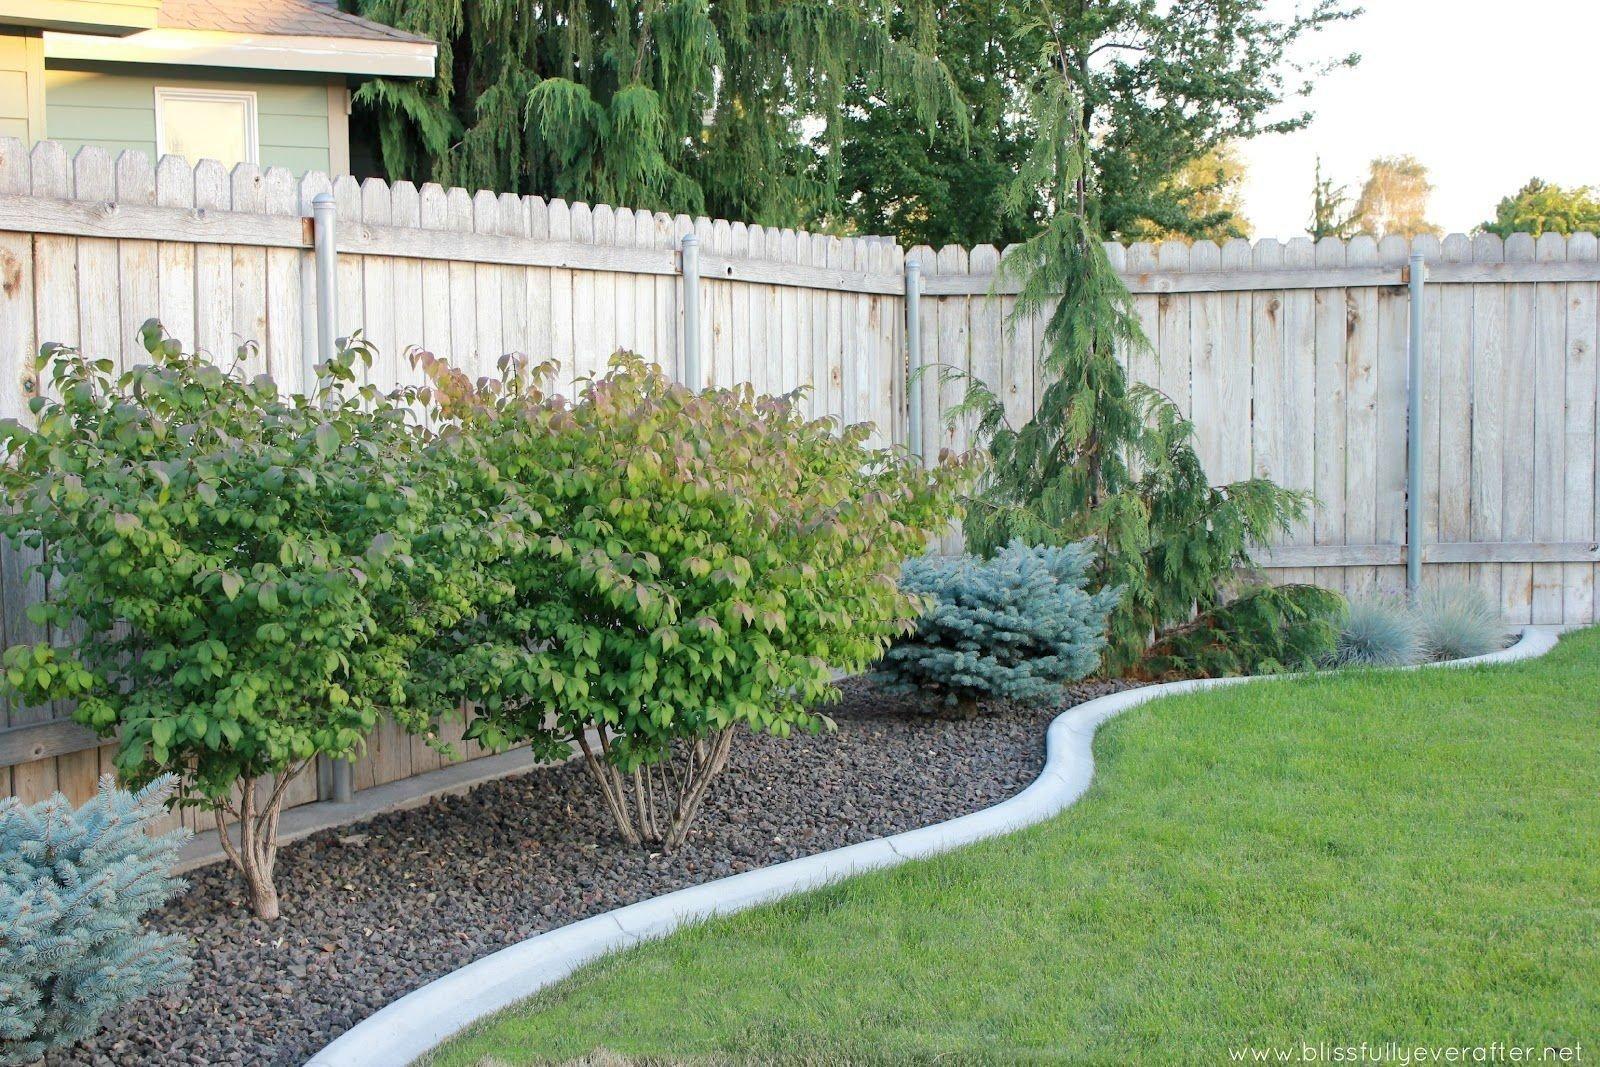 10 Spectacular Landscaping Ideas For Backyard On A Budget landscaping ideas for backyard on a budget yard design idea 2021